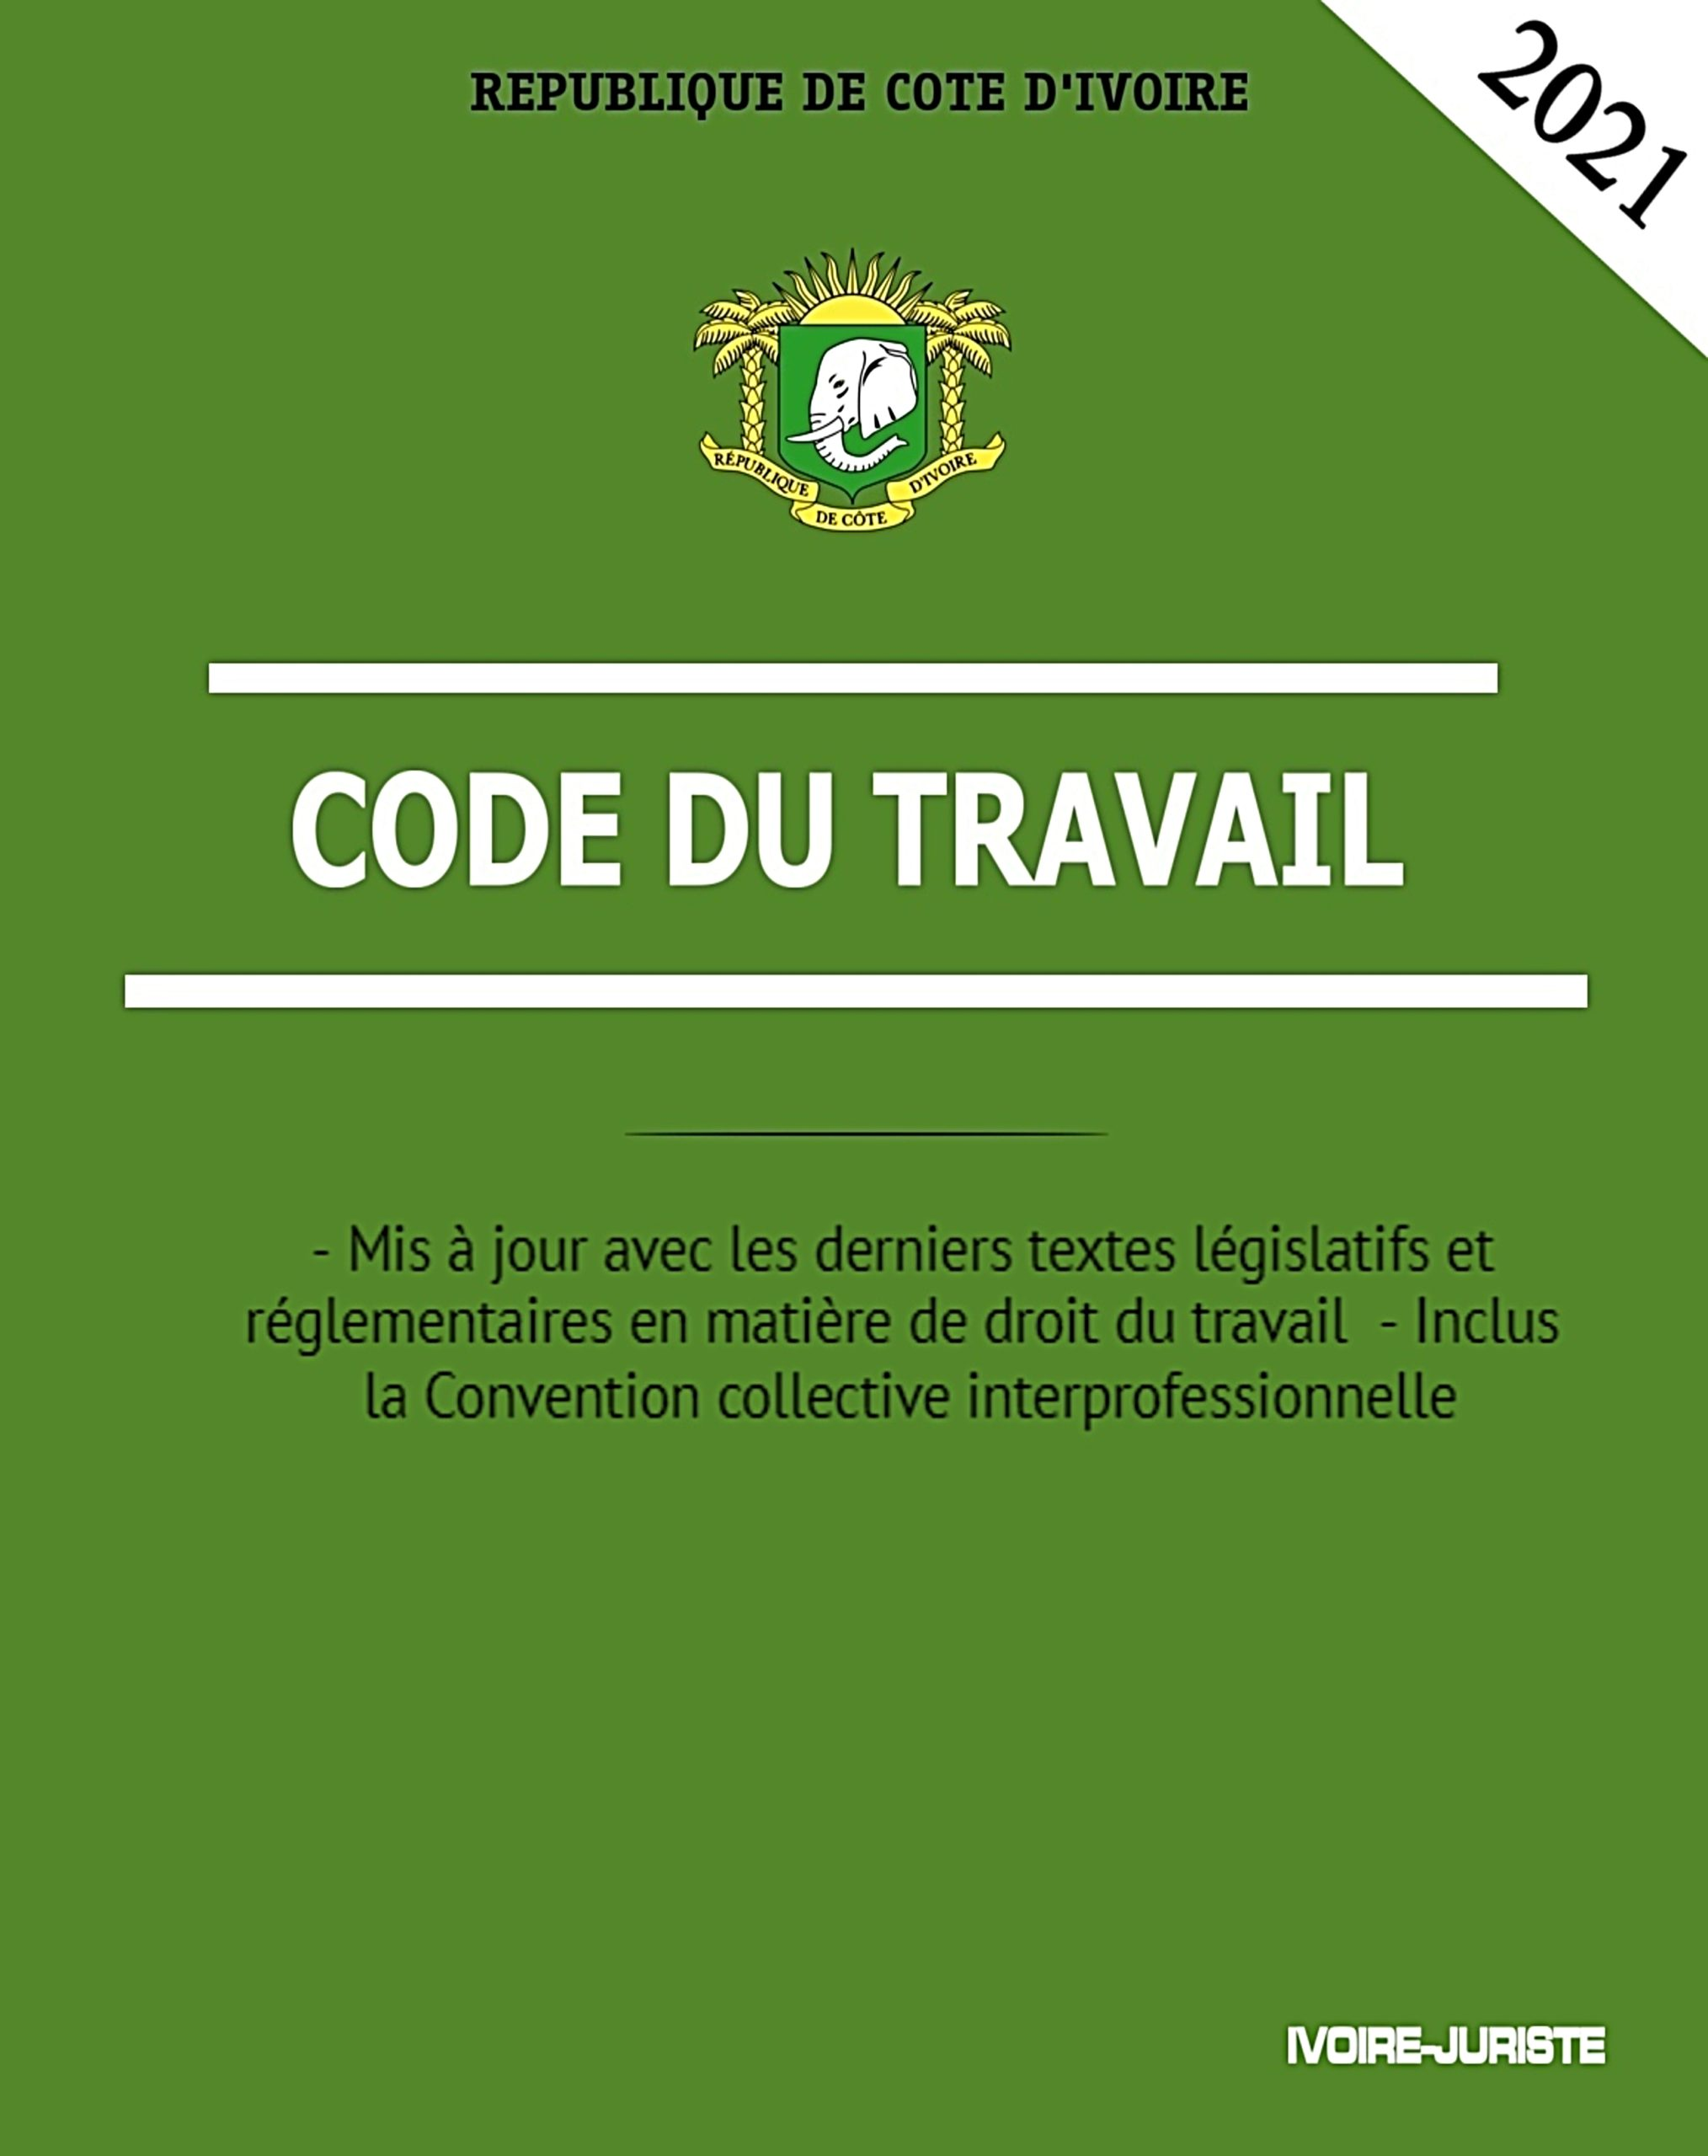 Code du travail ivoirien 2021